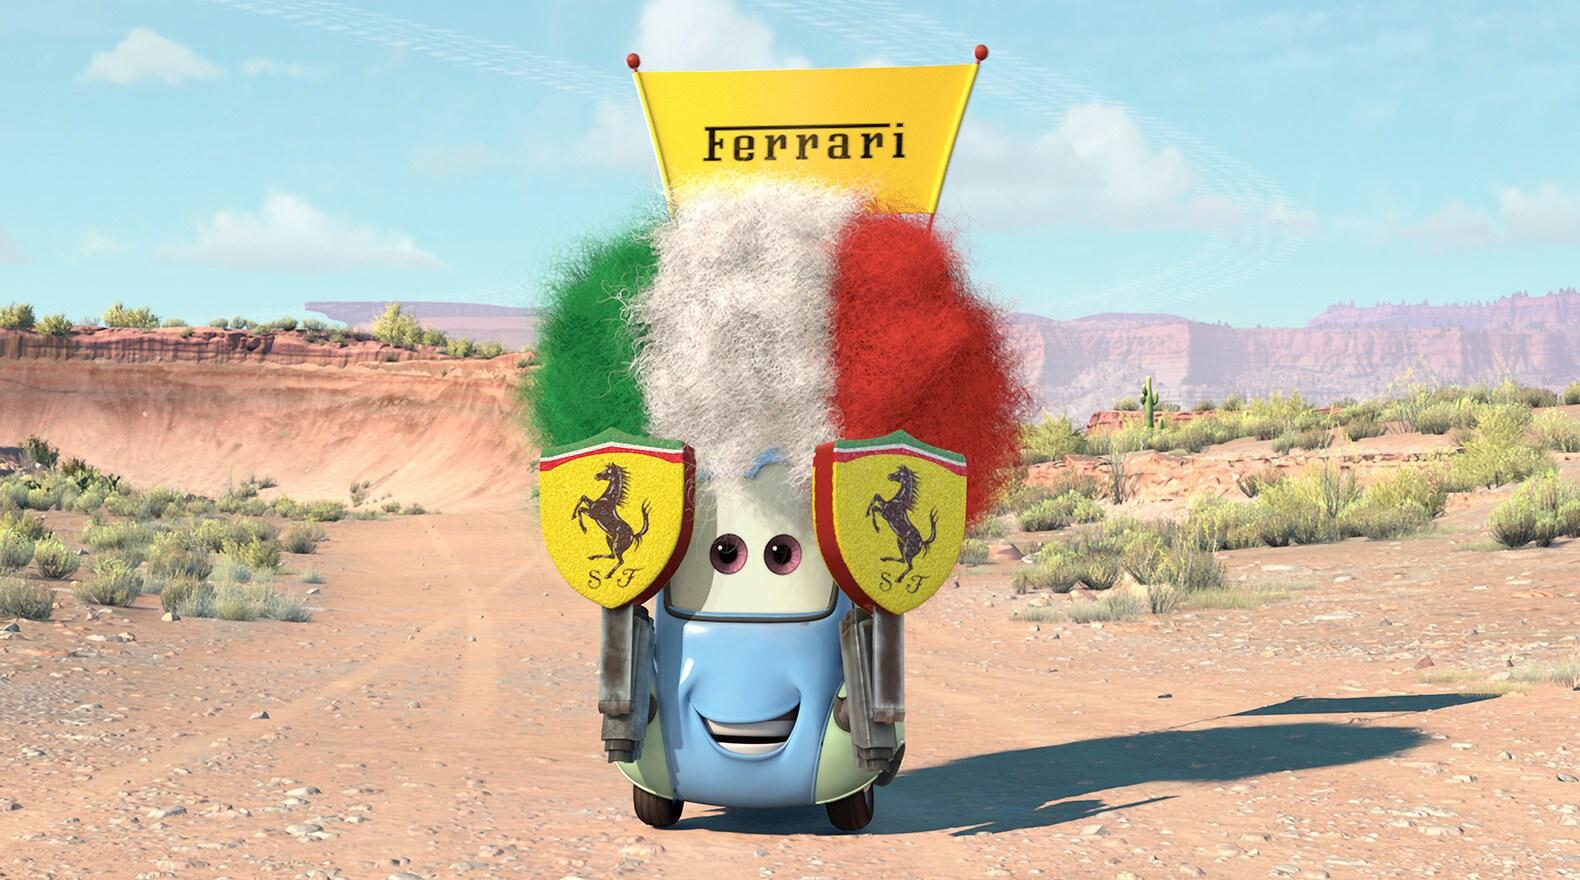 Guido is a little car, but a big Ferrari fan.